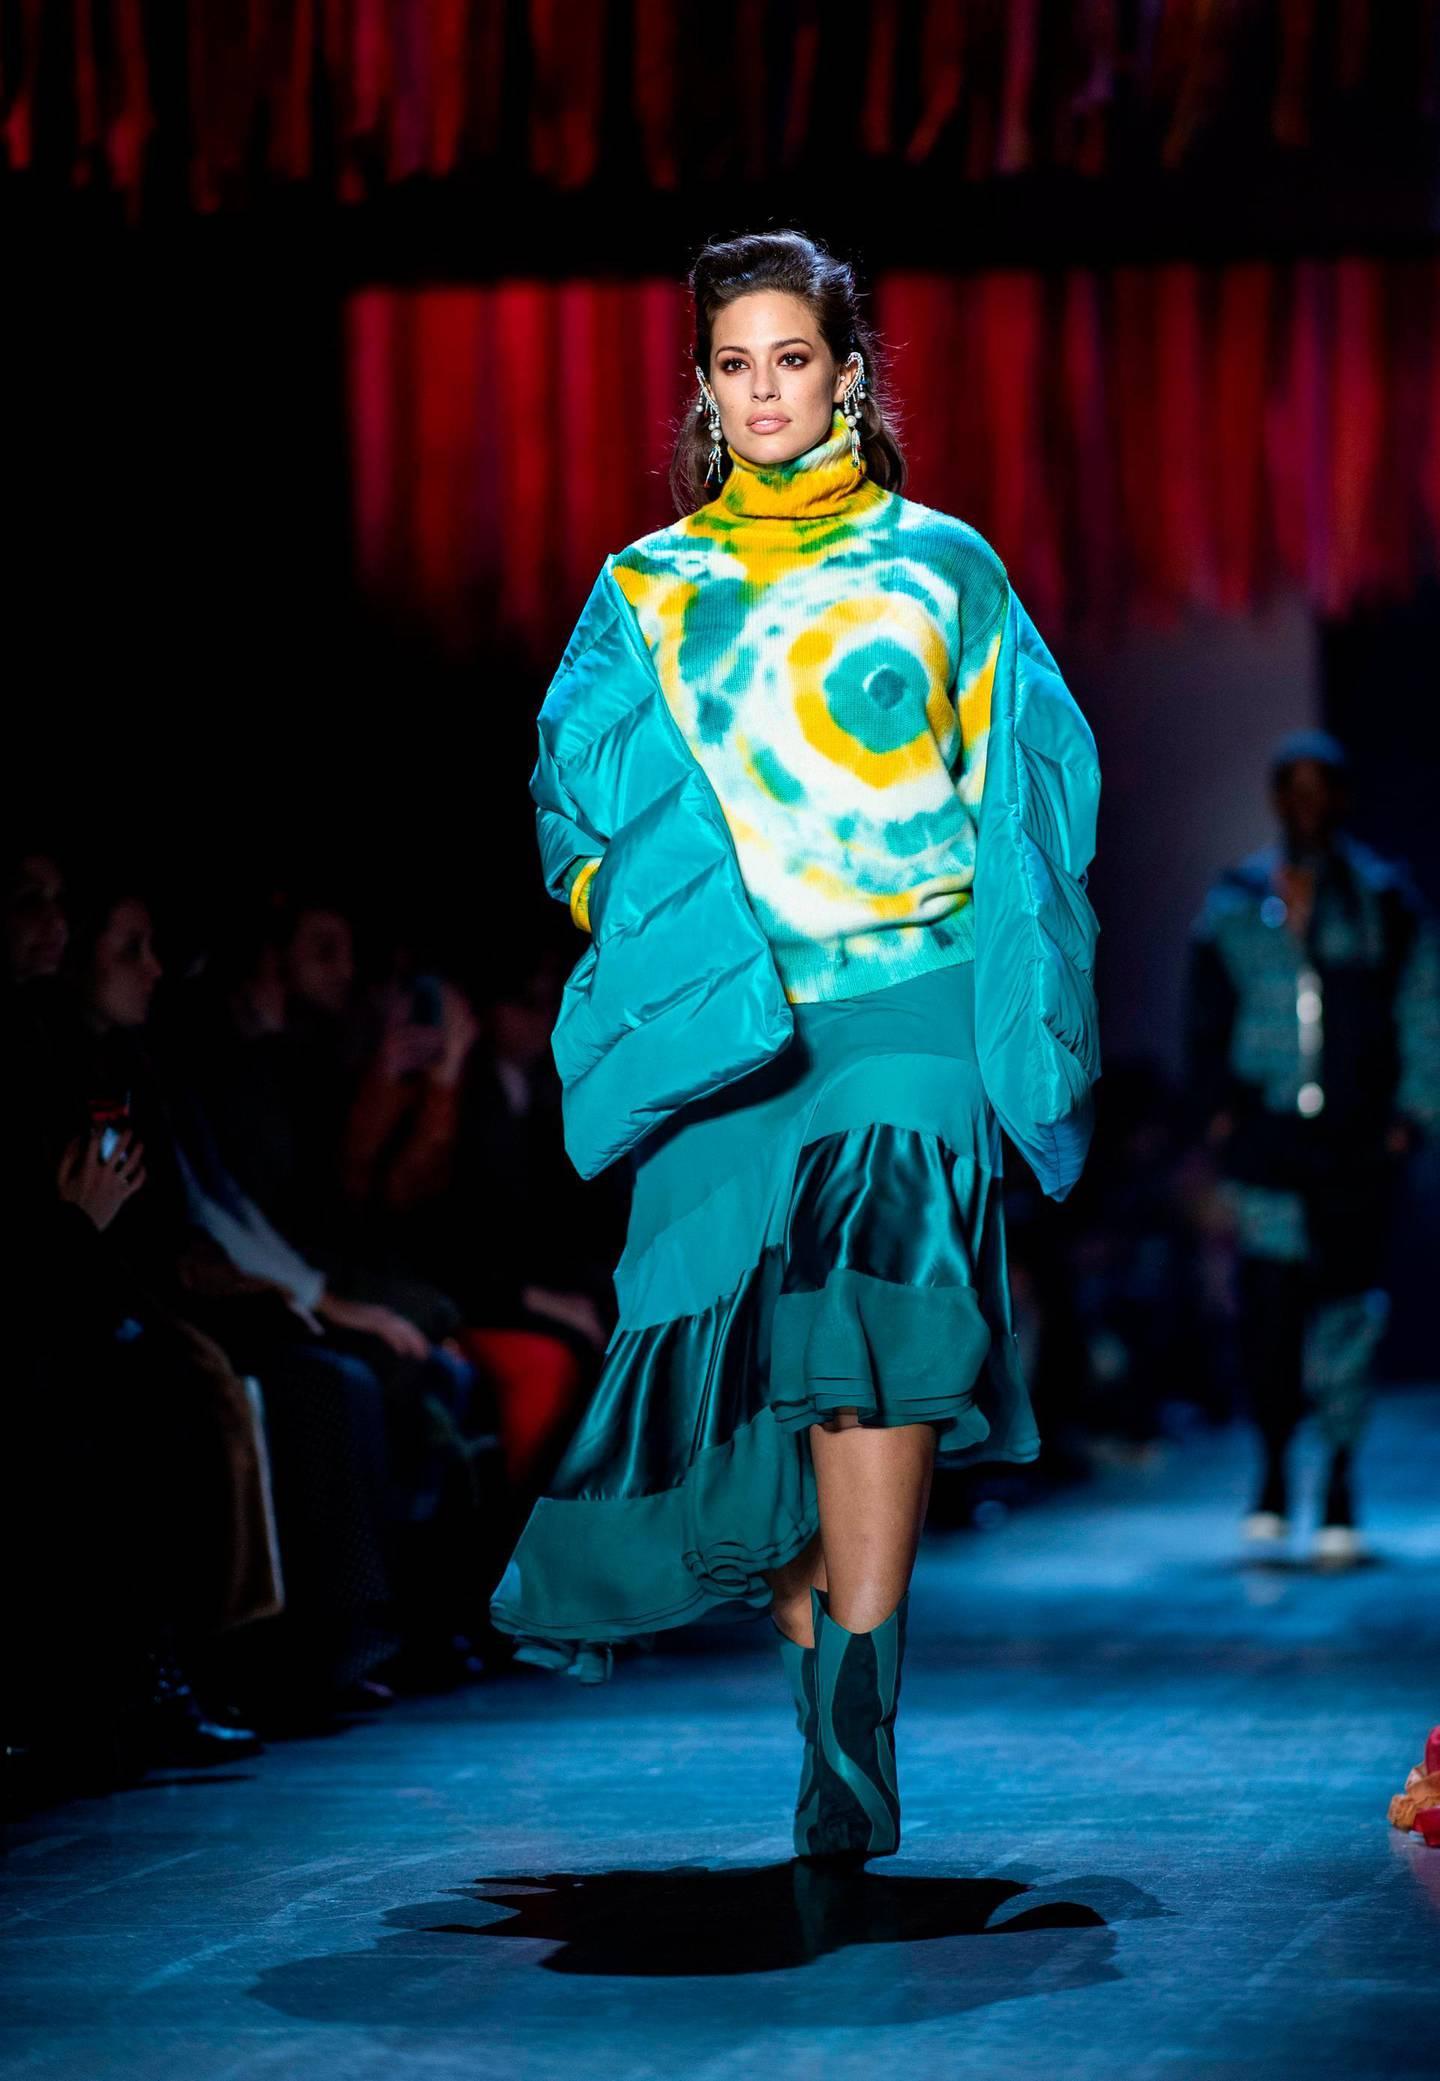 Model Ashley Graham walks the runway of Prabal Gurung fashion show during New York Fashion Week on February 10, 2019 in New York City.  / AFP / Johannes EISELE